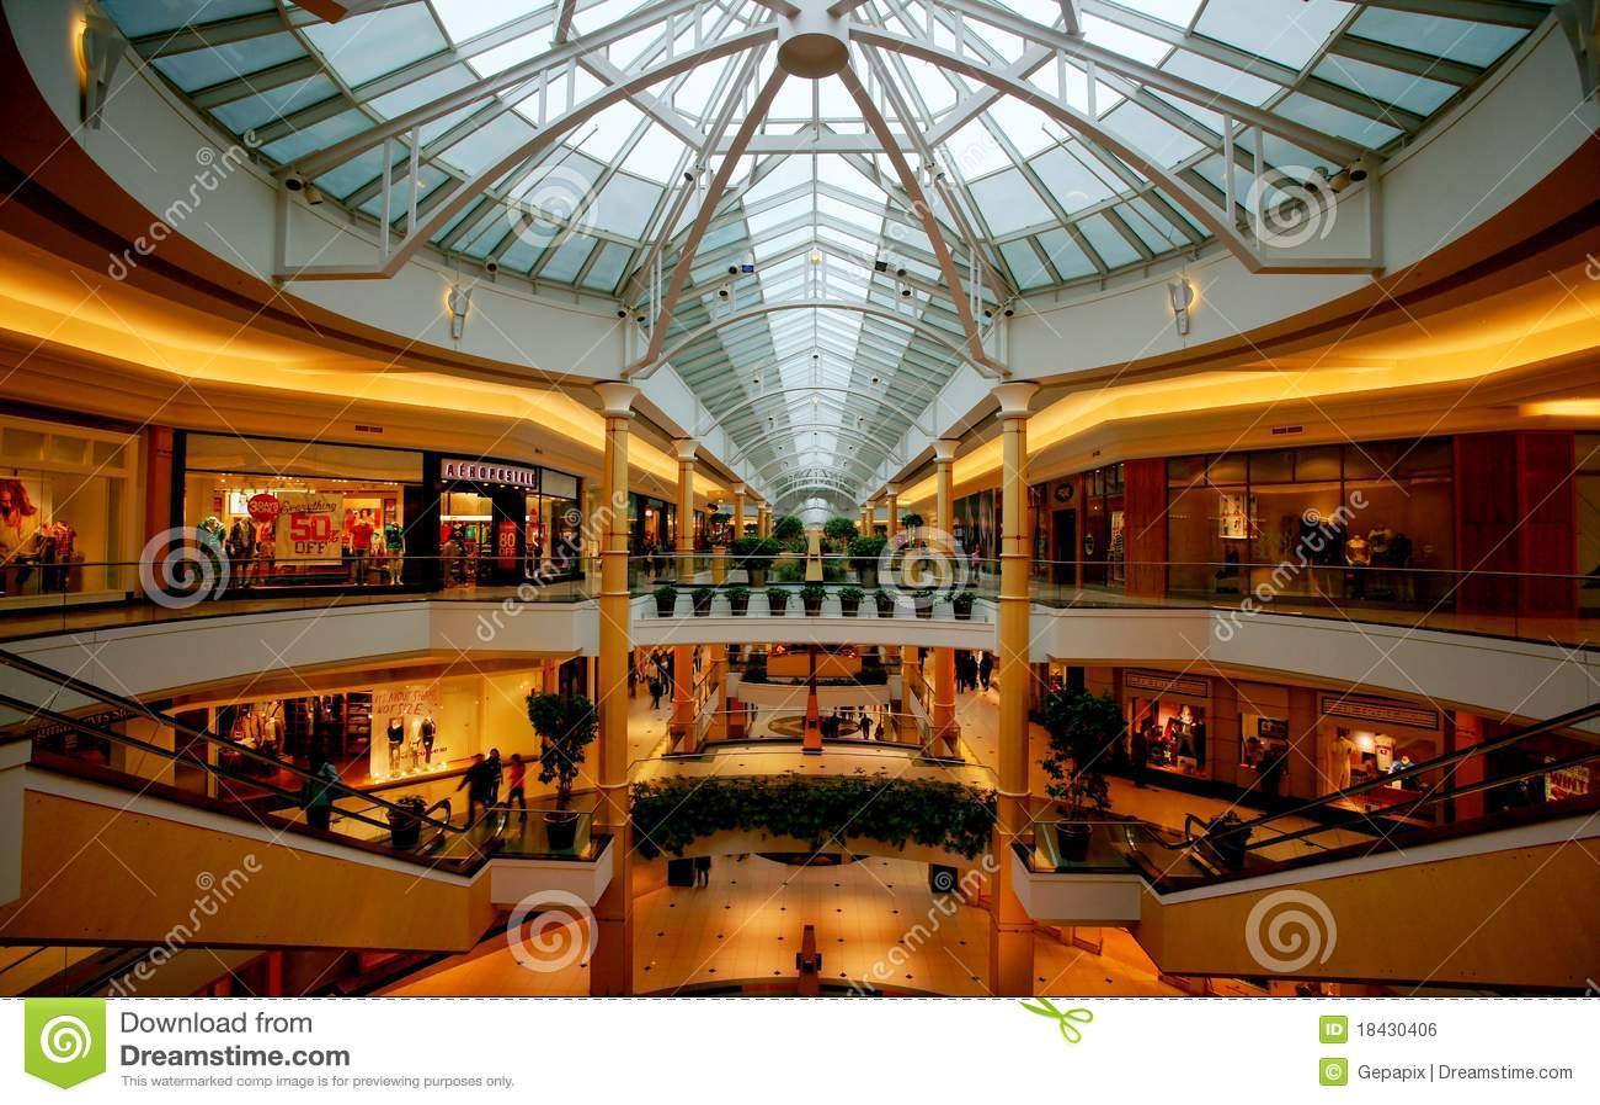 Alameda de compras